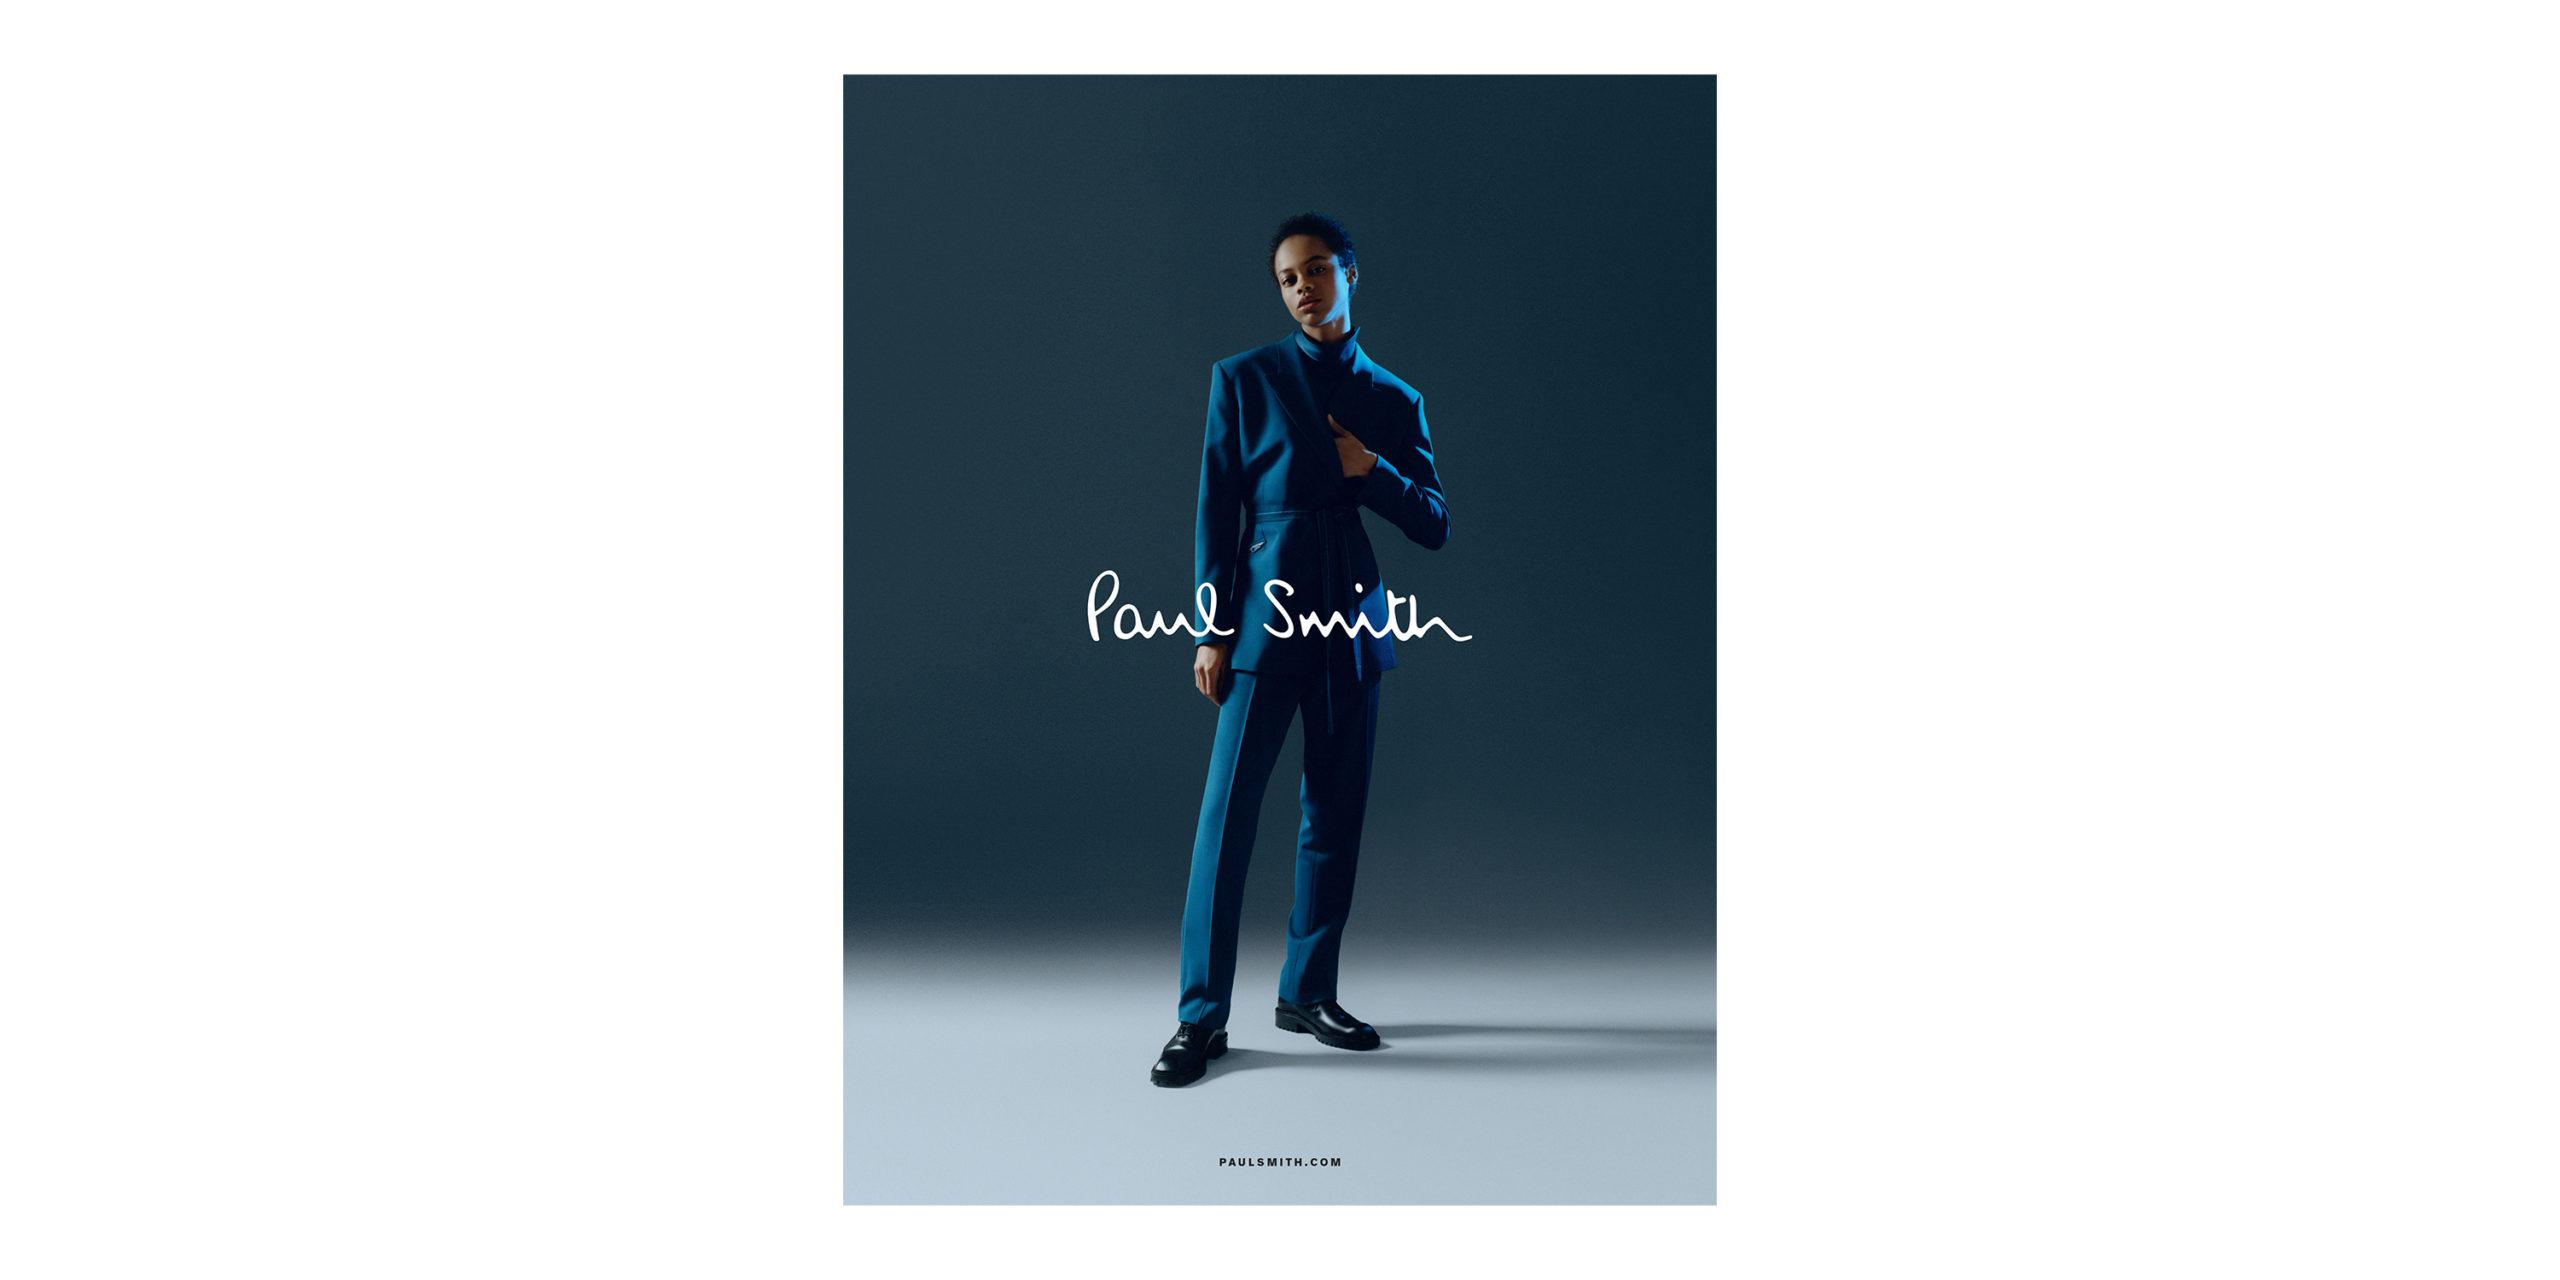 PAUL-SMITH-AW20-CAMPAIGN-BY-GREG-LIN-JIAJIE_3-1